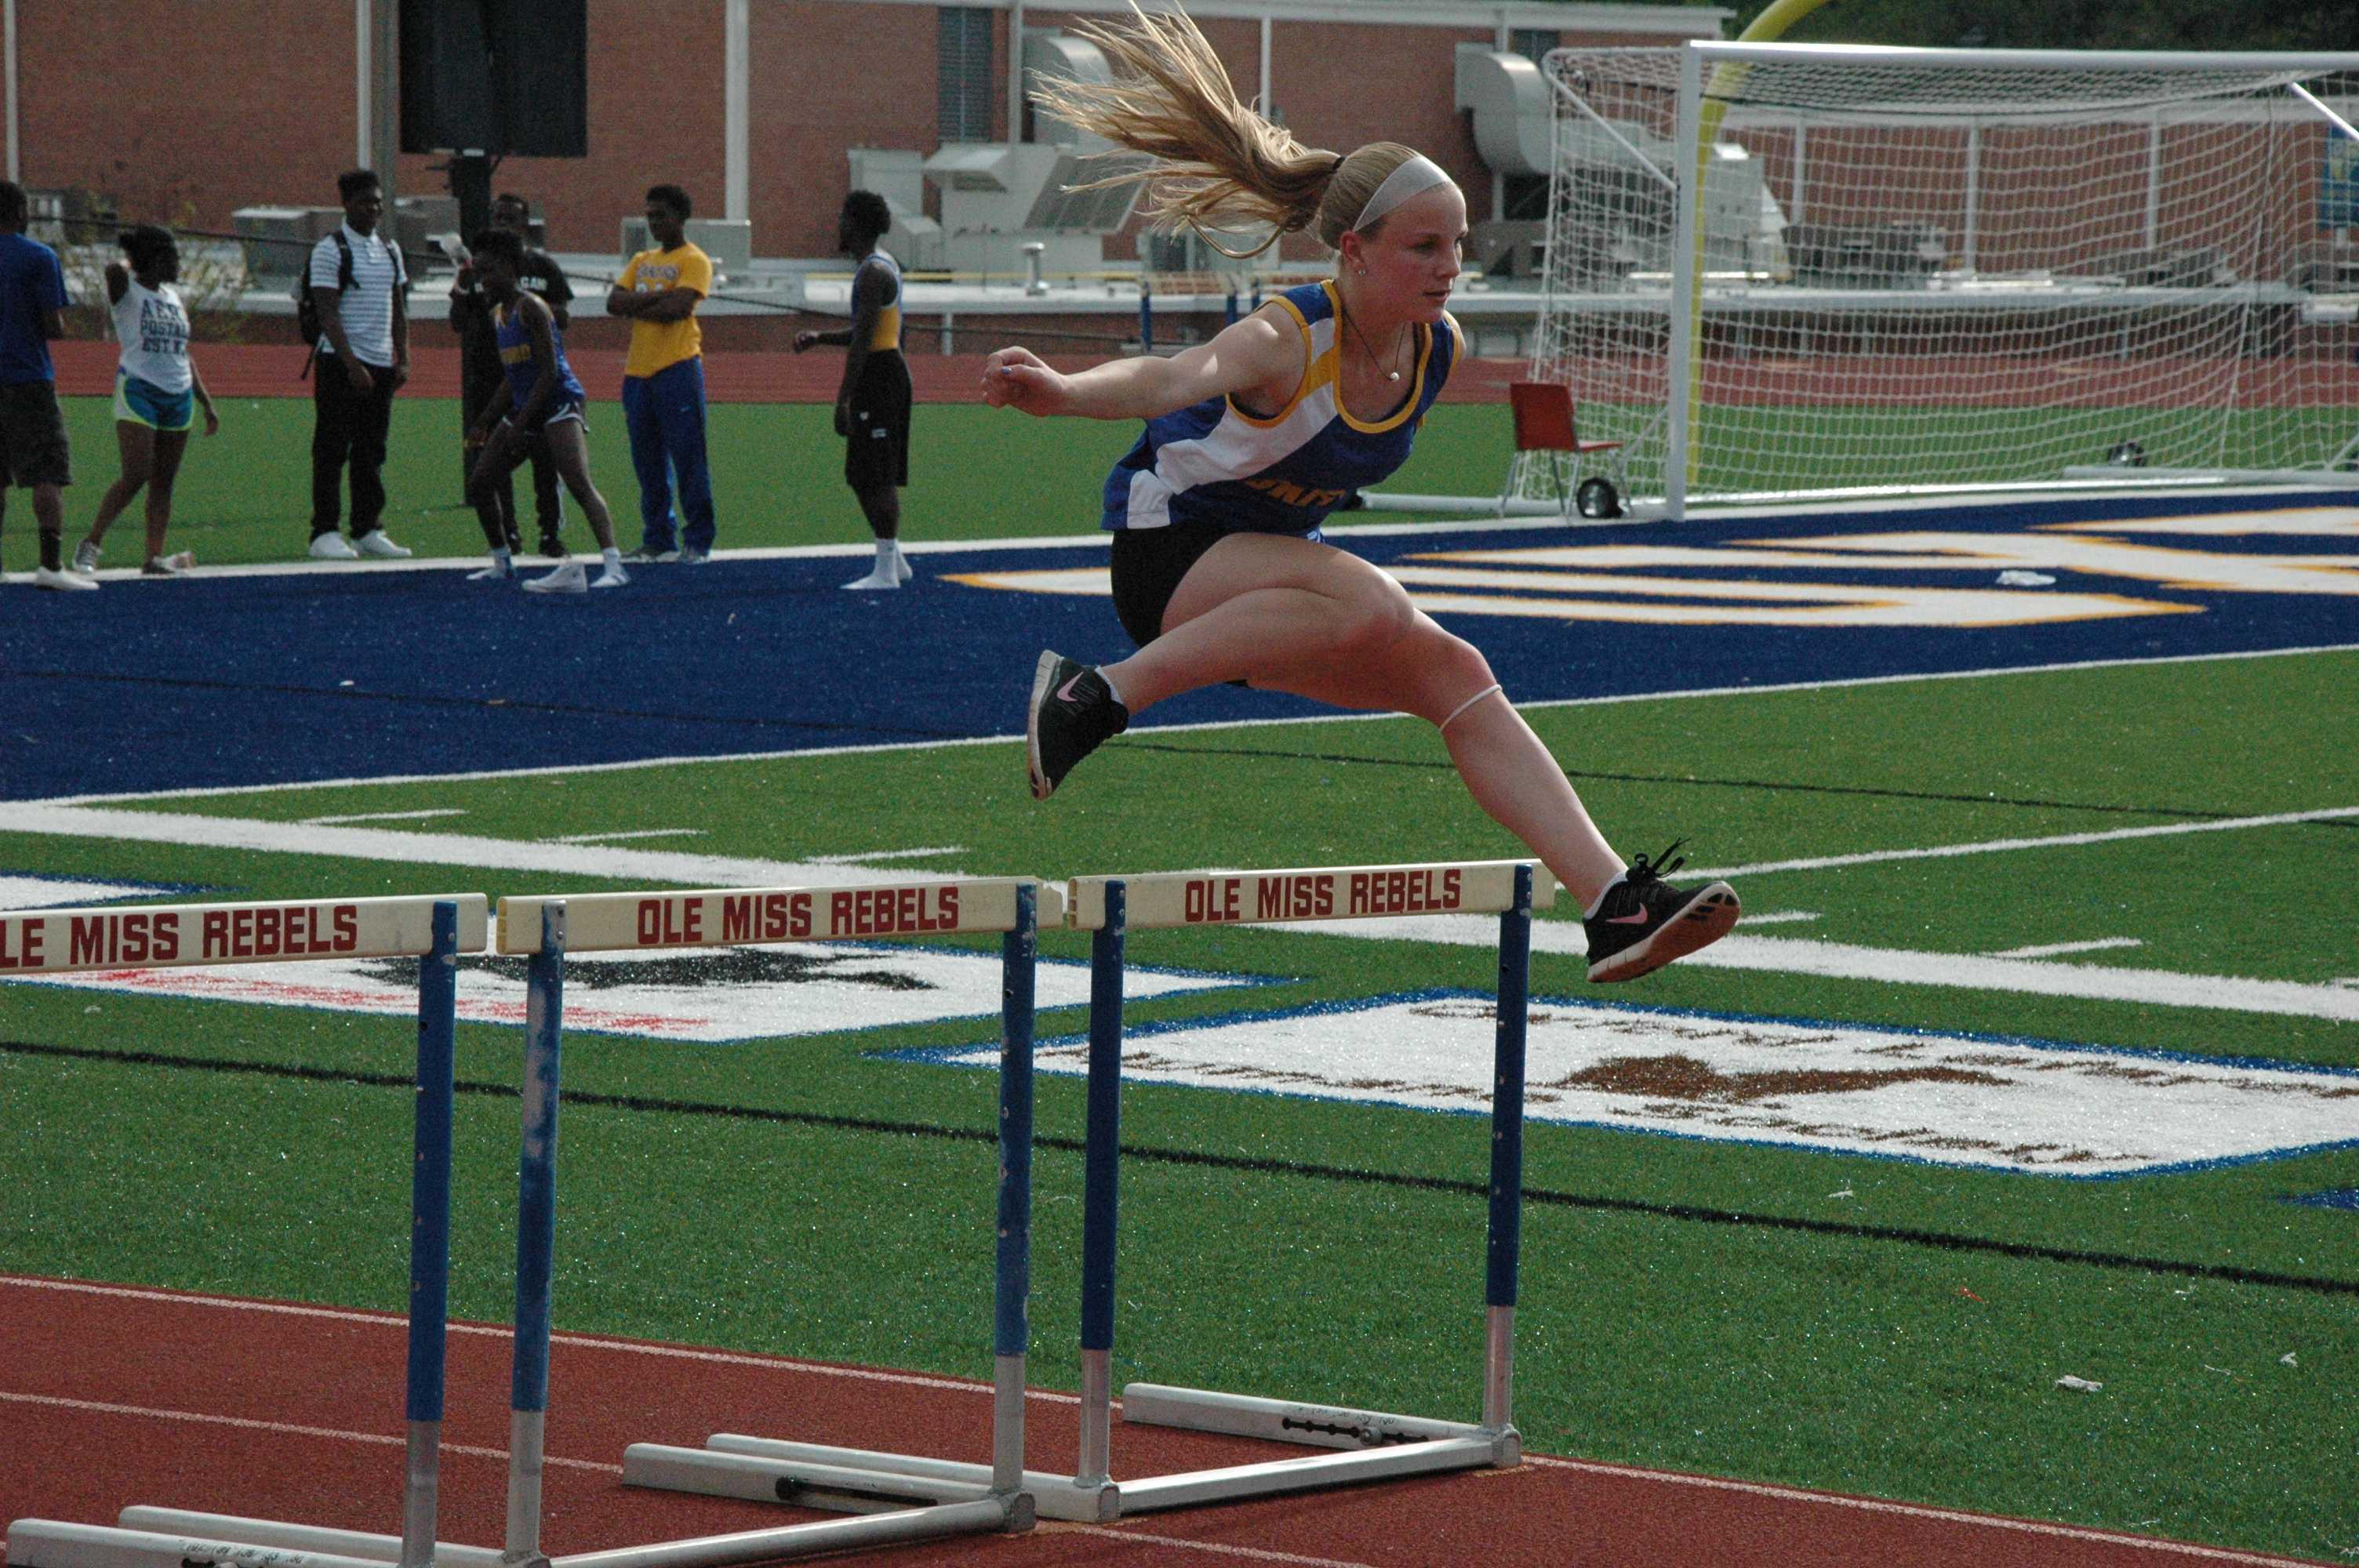 Middle+schooler+Emily+Hayward+practices+before+the+100+meter+hurdles.